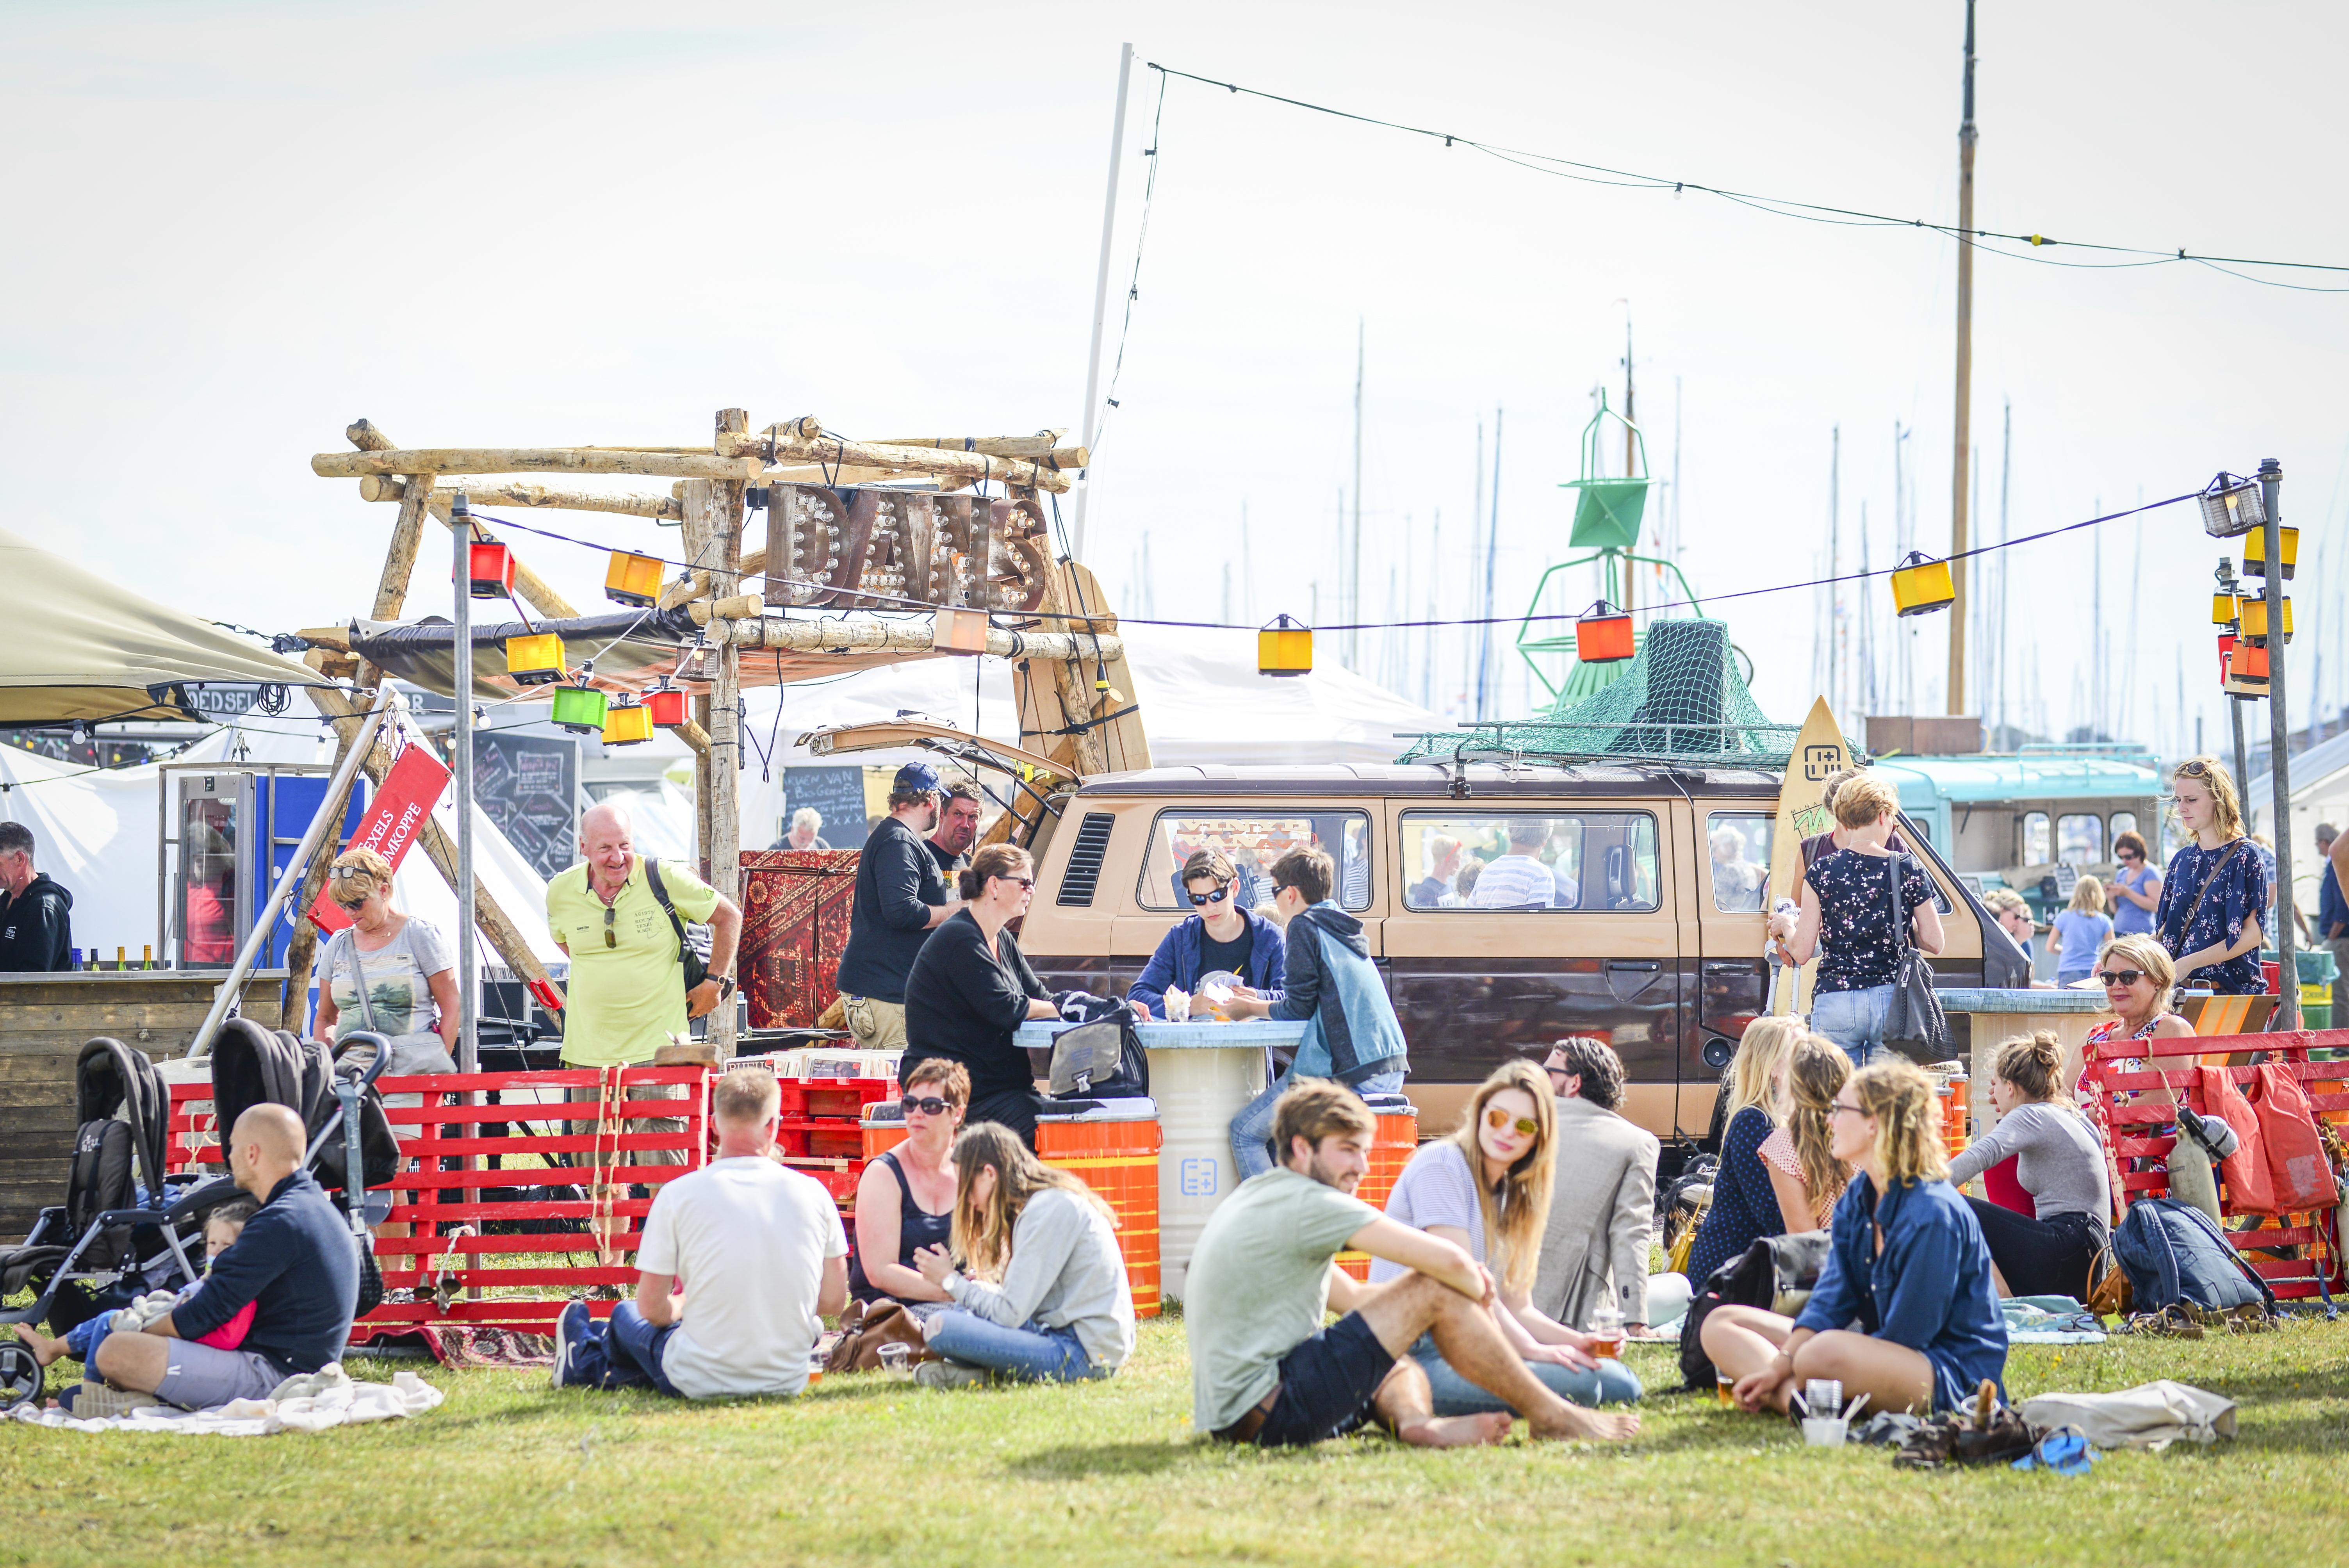 Beach Food Festival Oudeschild Waddenstrand 2017 fotograaf Liselotte Schoo VVV Texel